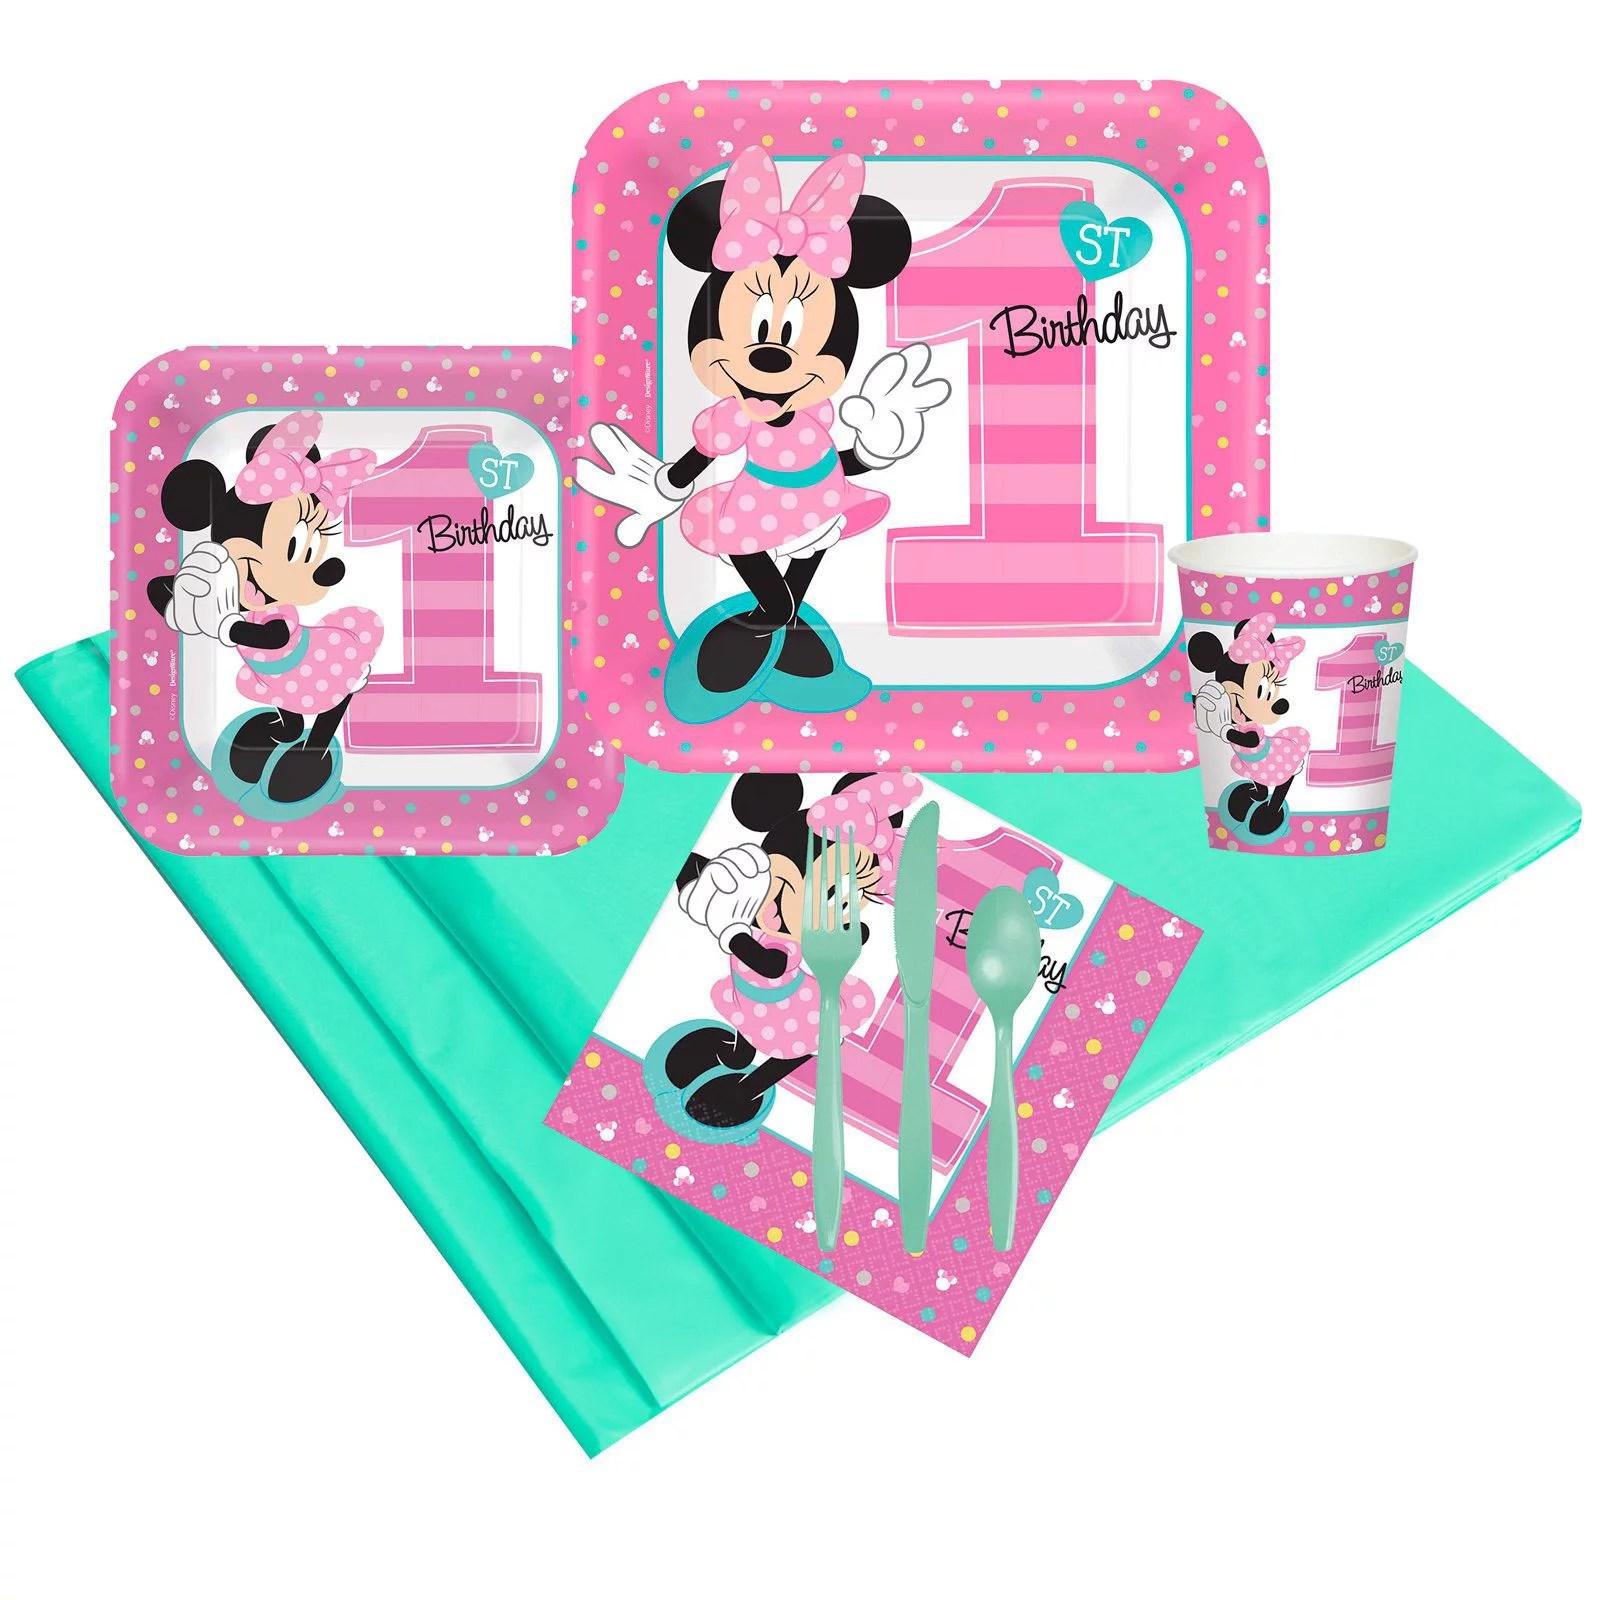 Disney Minnie Mouse 1st Birthday Party Pack 24 Walmart Com Walmart Com